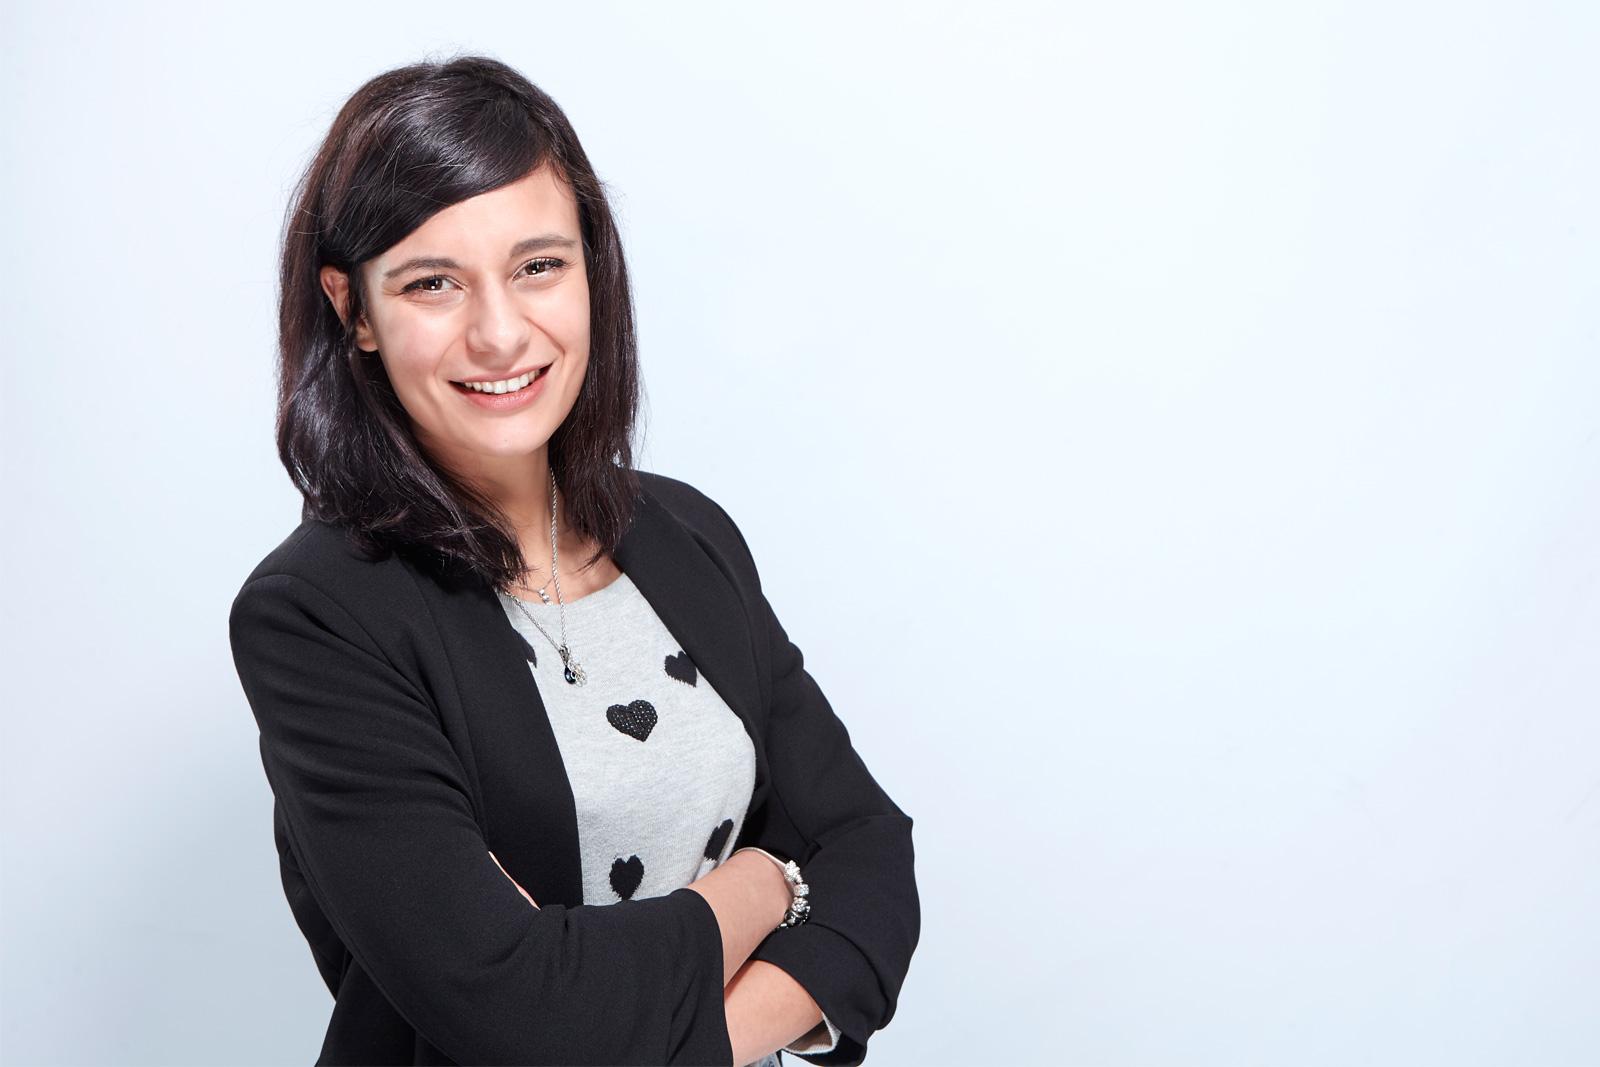 Cristina Maletta